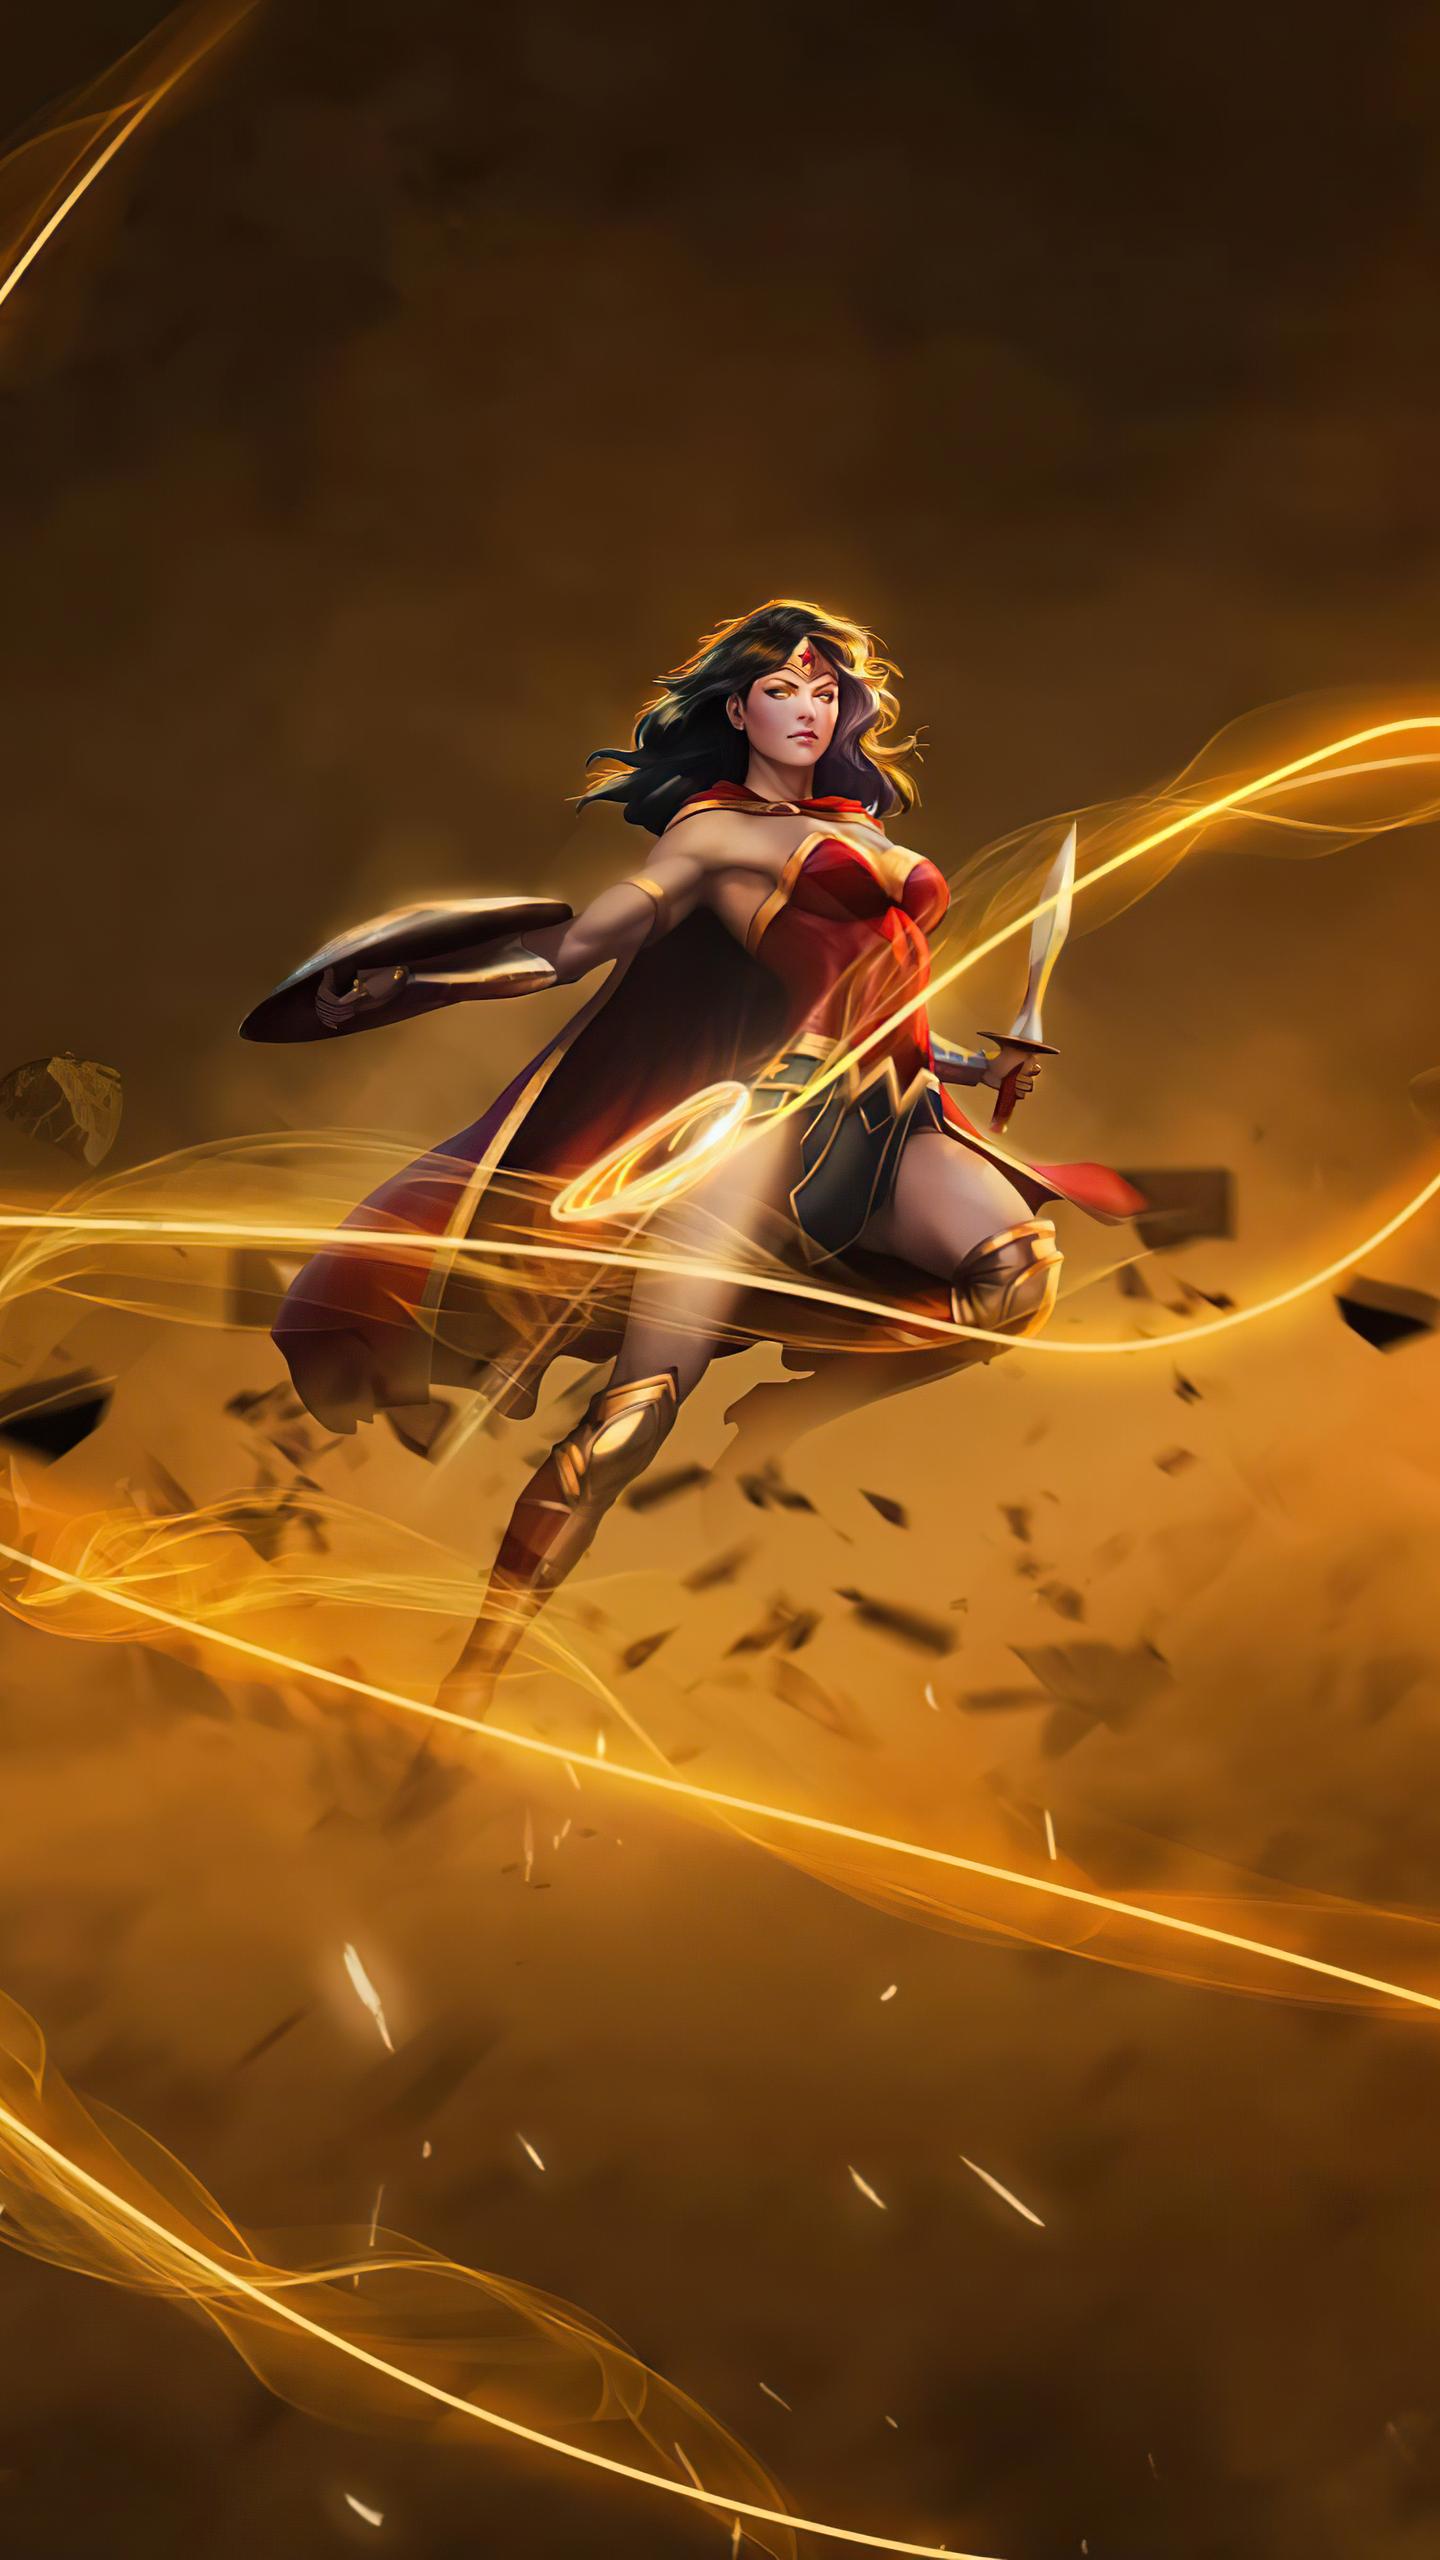 wonder-woman-ability-4k-xe.jpg